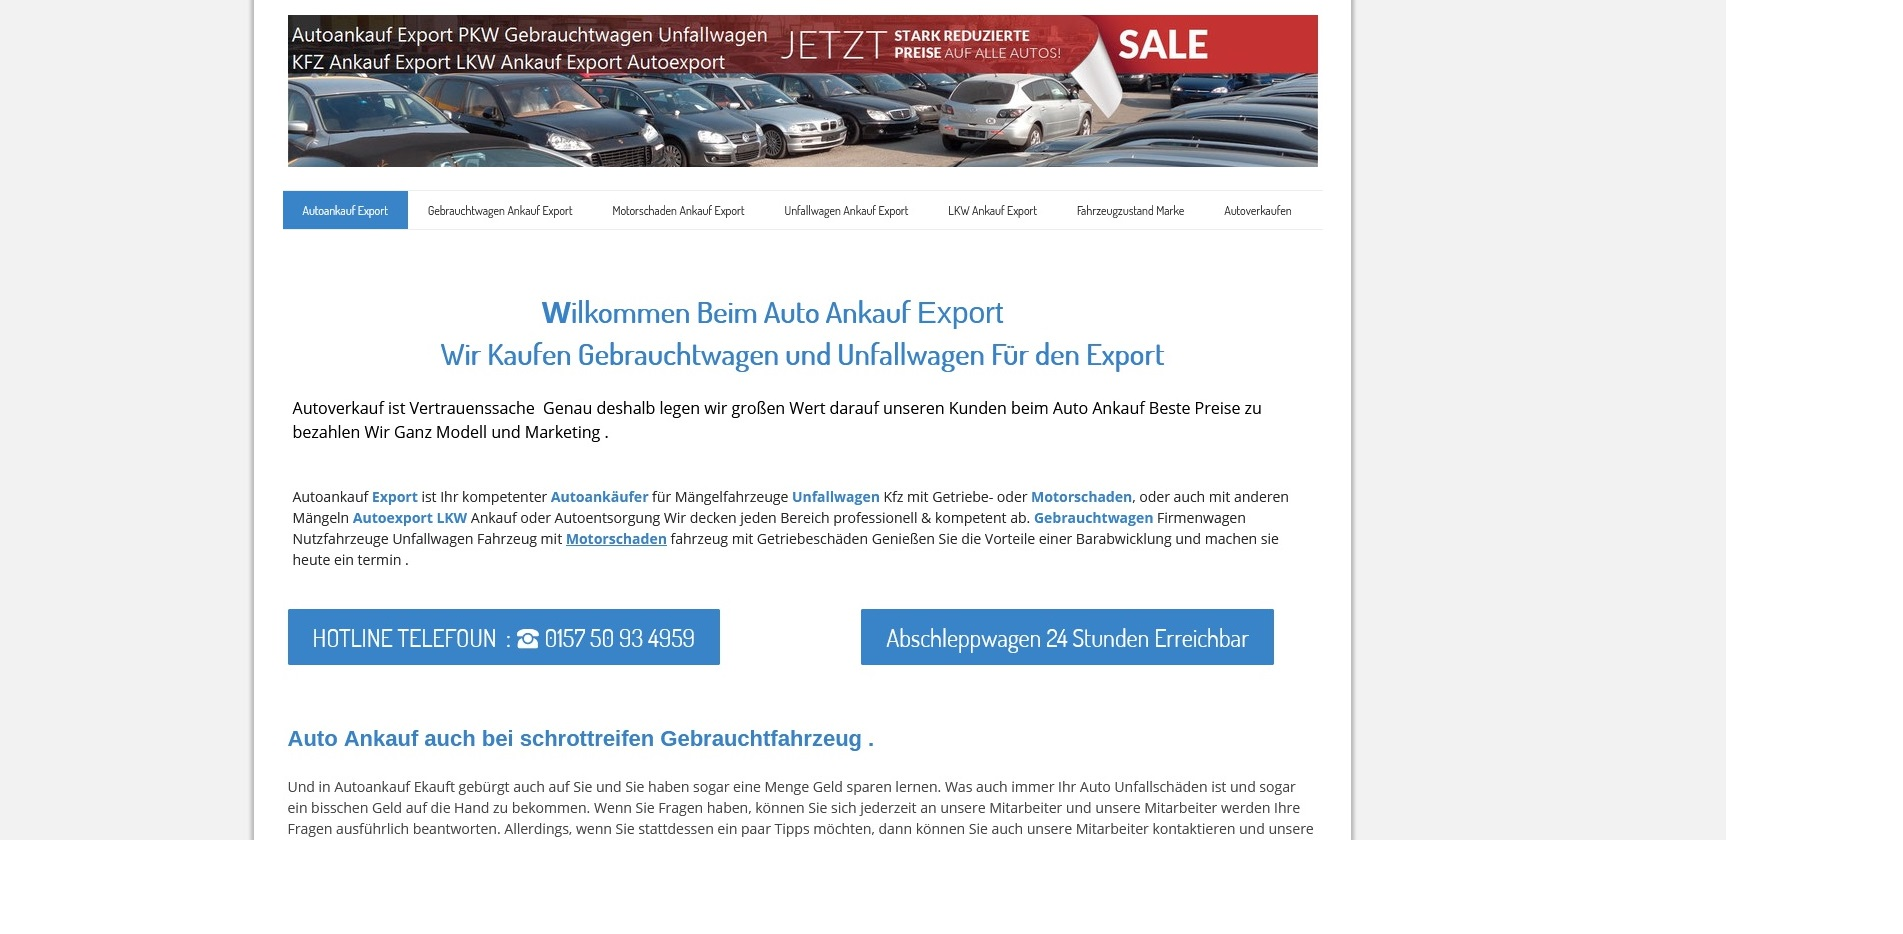 https://www.kfz-ankauf-export.de - Autoankauf Ravensburg